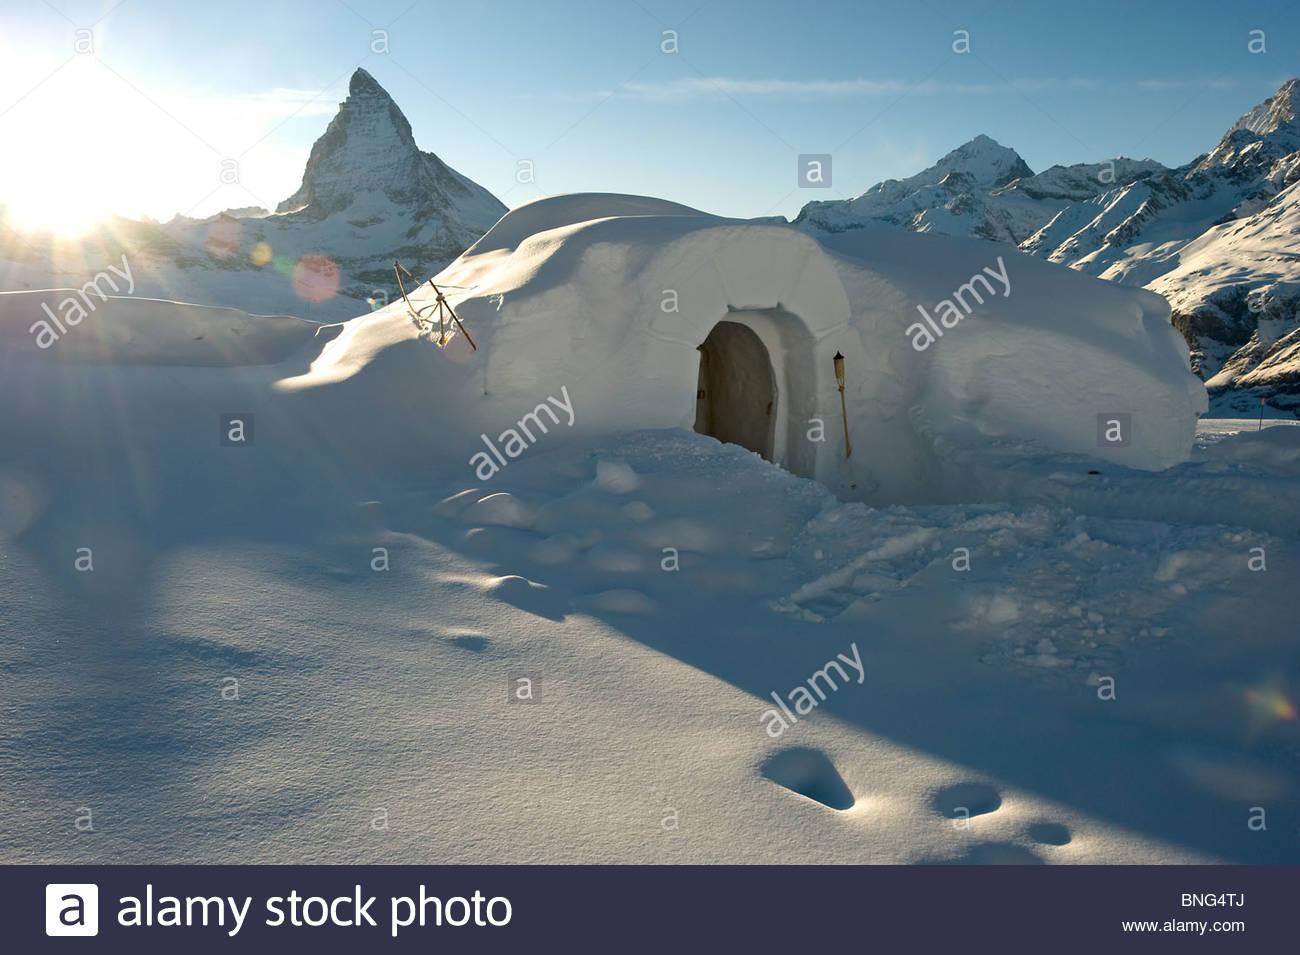 The Iglu Dorf is a hotel,restaurant and bar in igloos on the Gornergrat slopes. Zermatt,Valais canton,SWITZERLAND - Stock Image